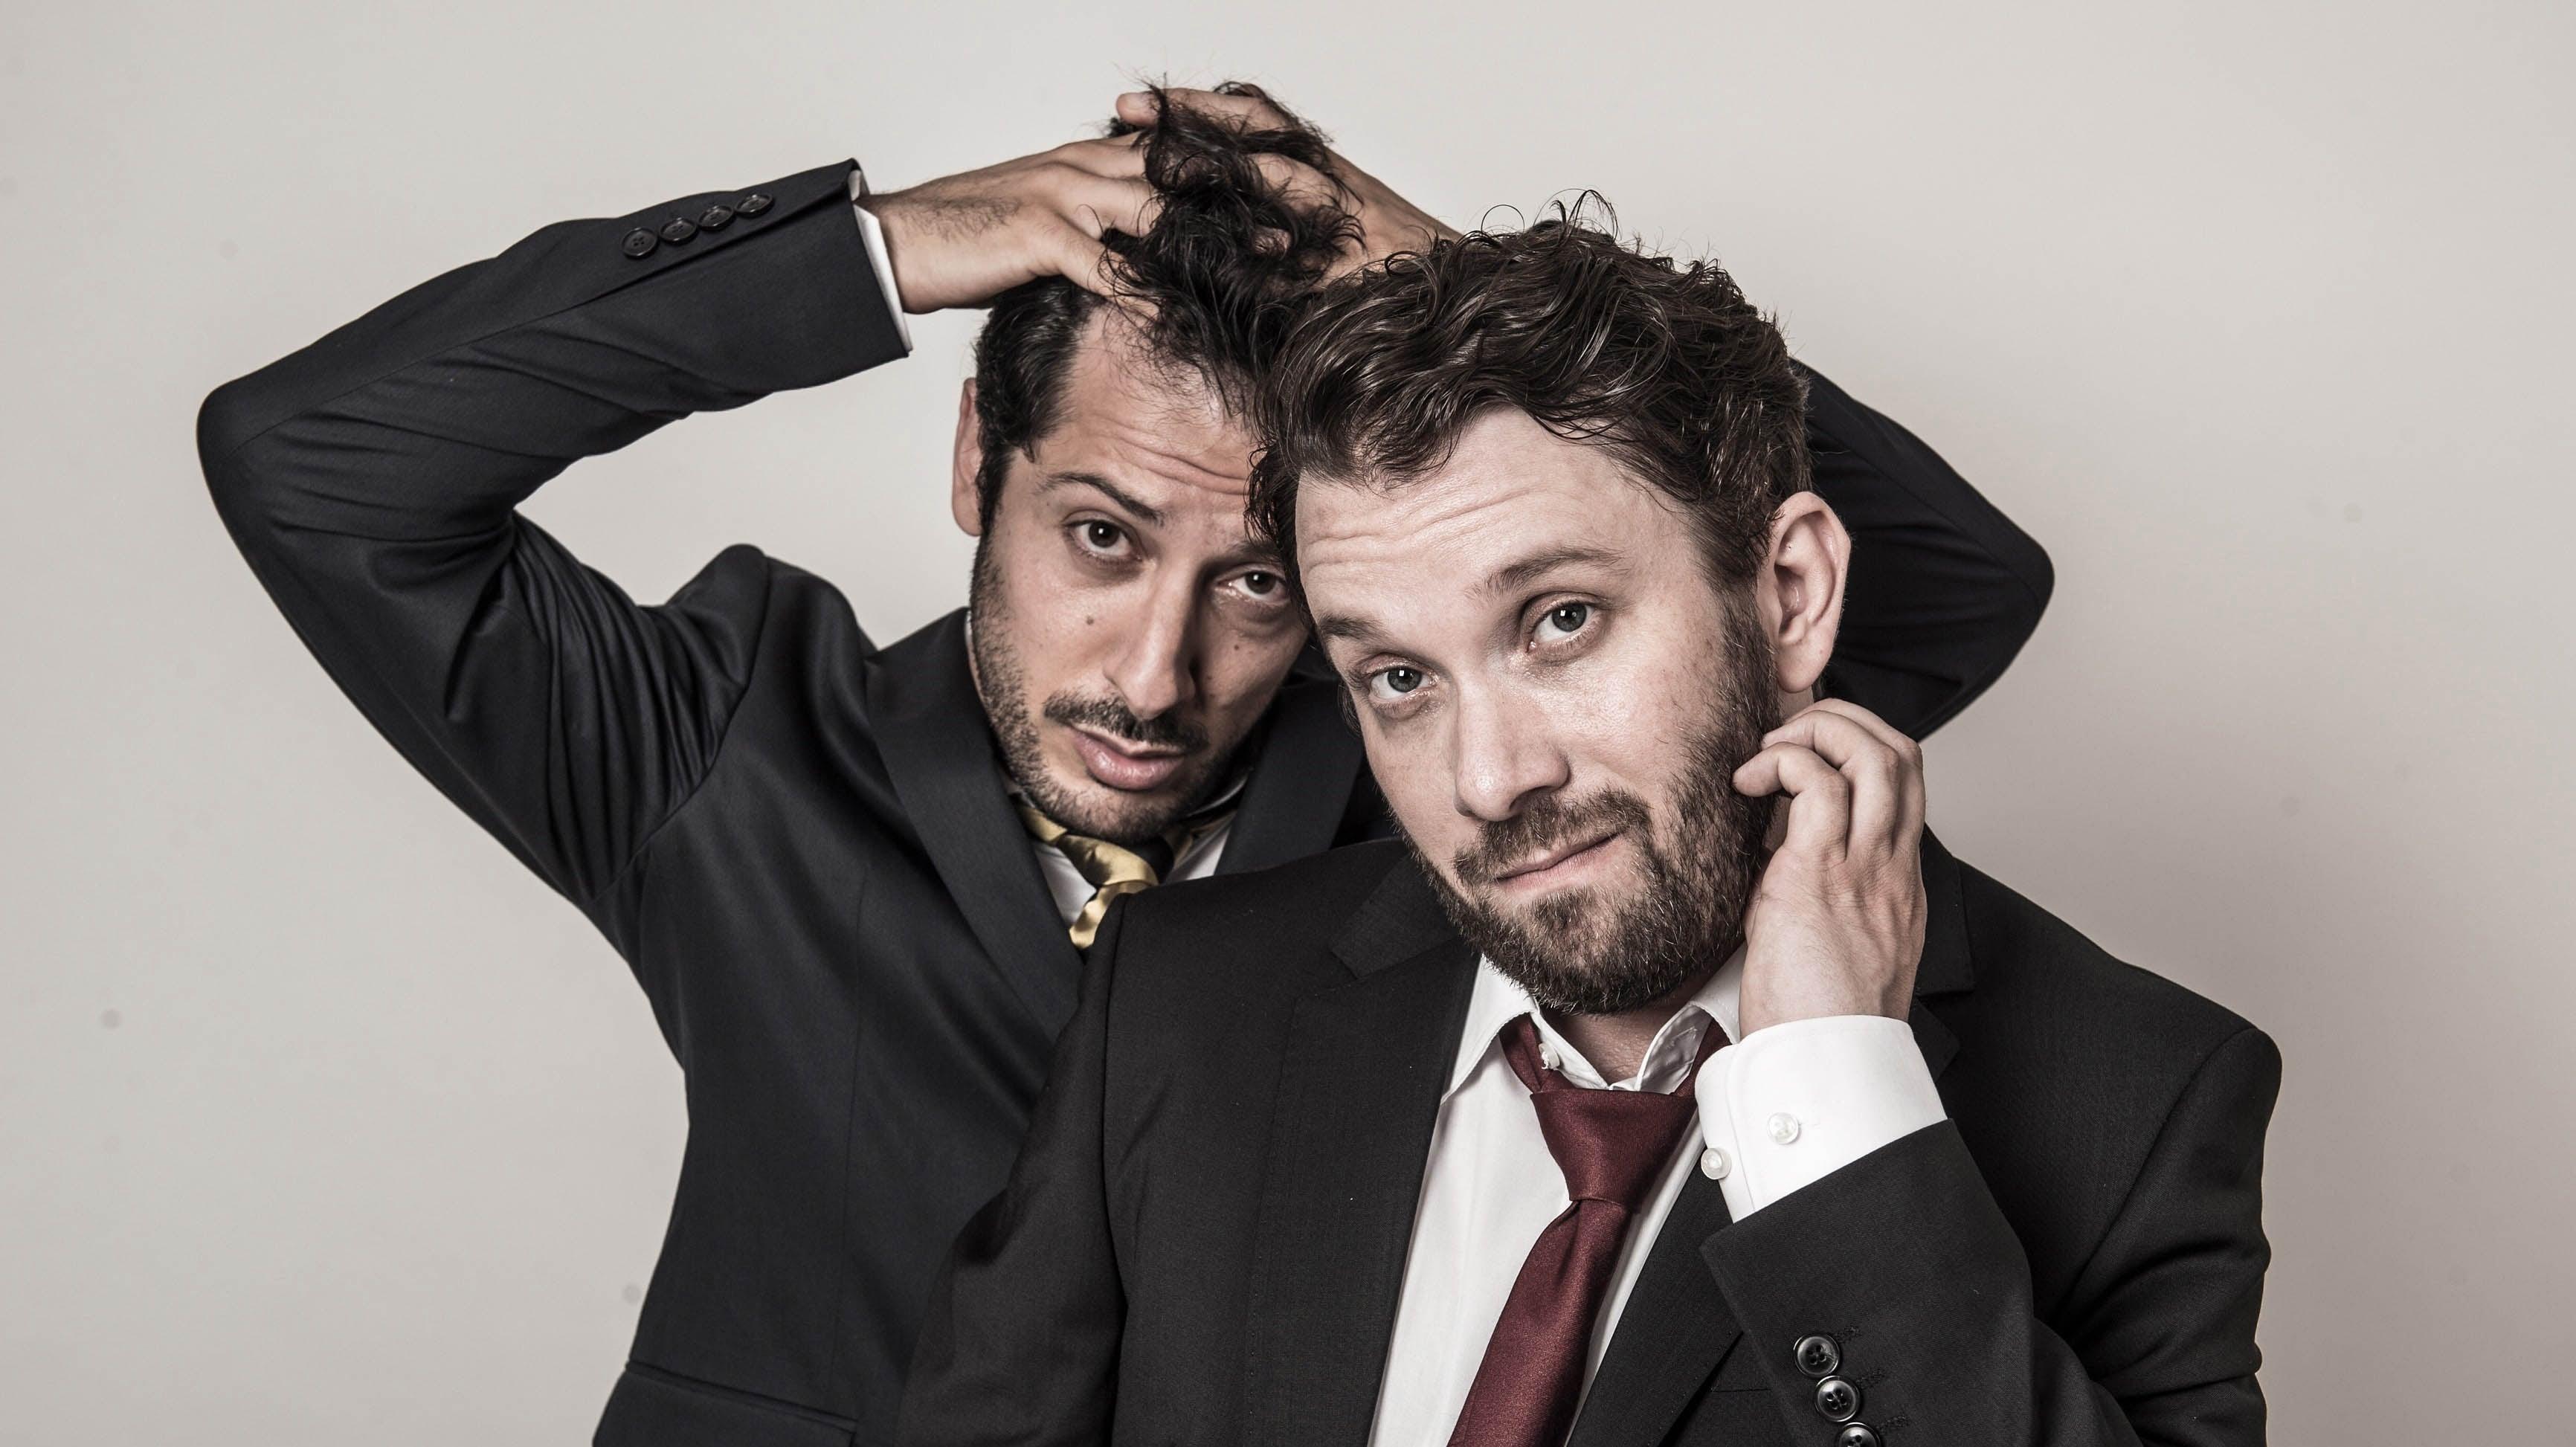 Christian Ulmen und Fahri Yardim, Bild: Jens Koch